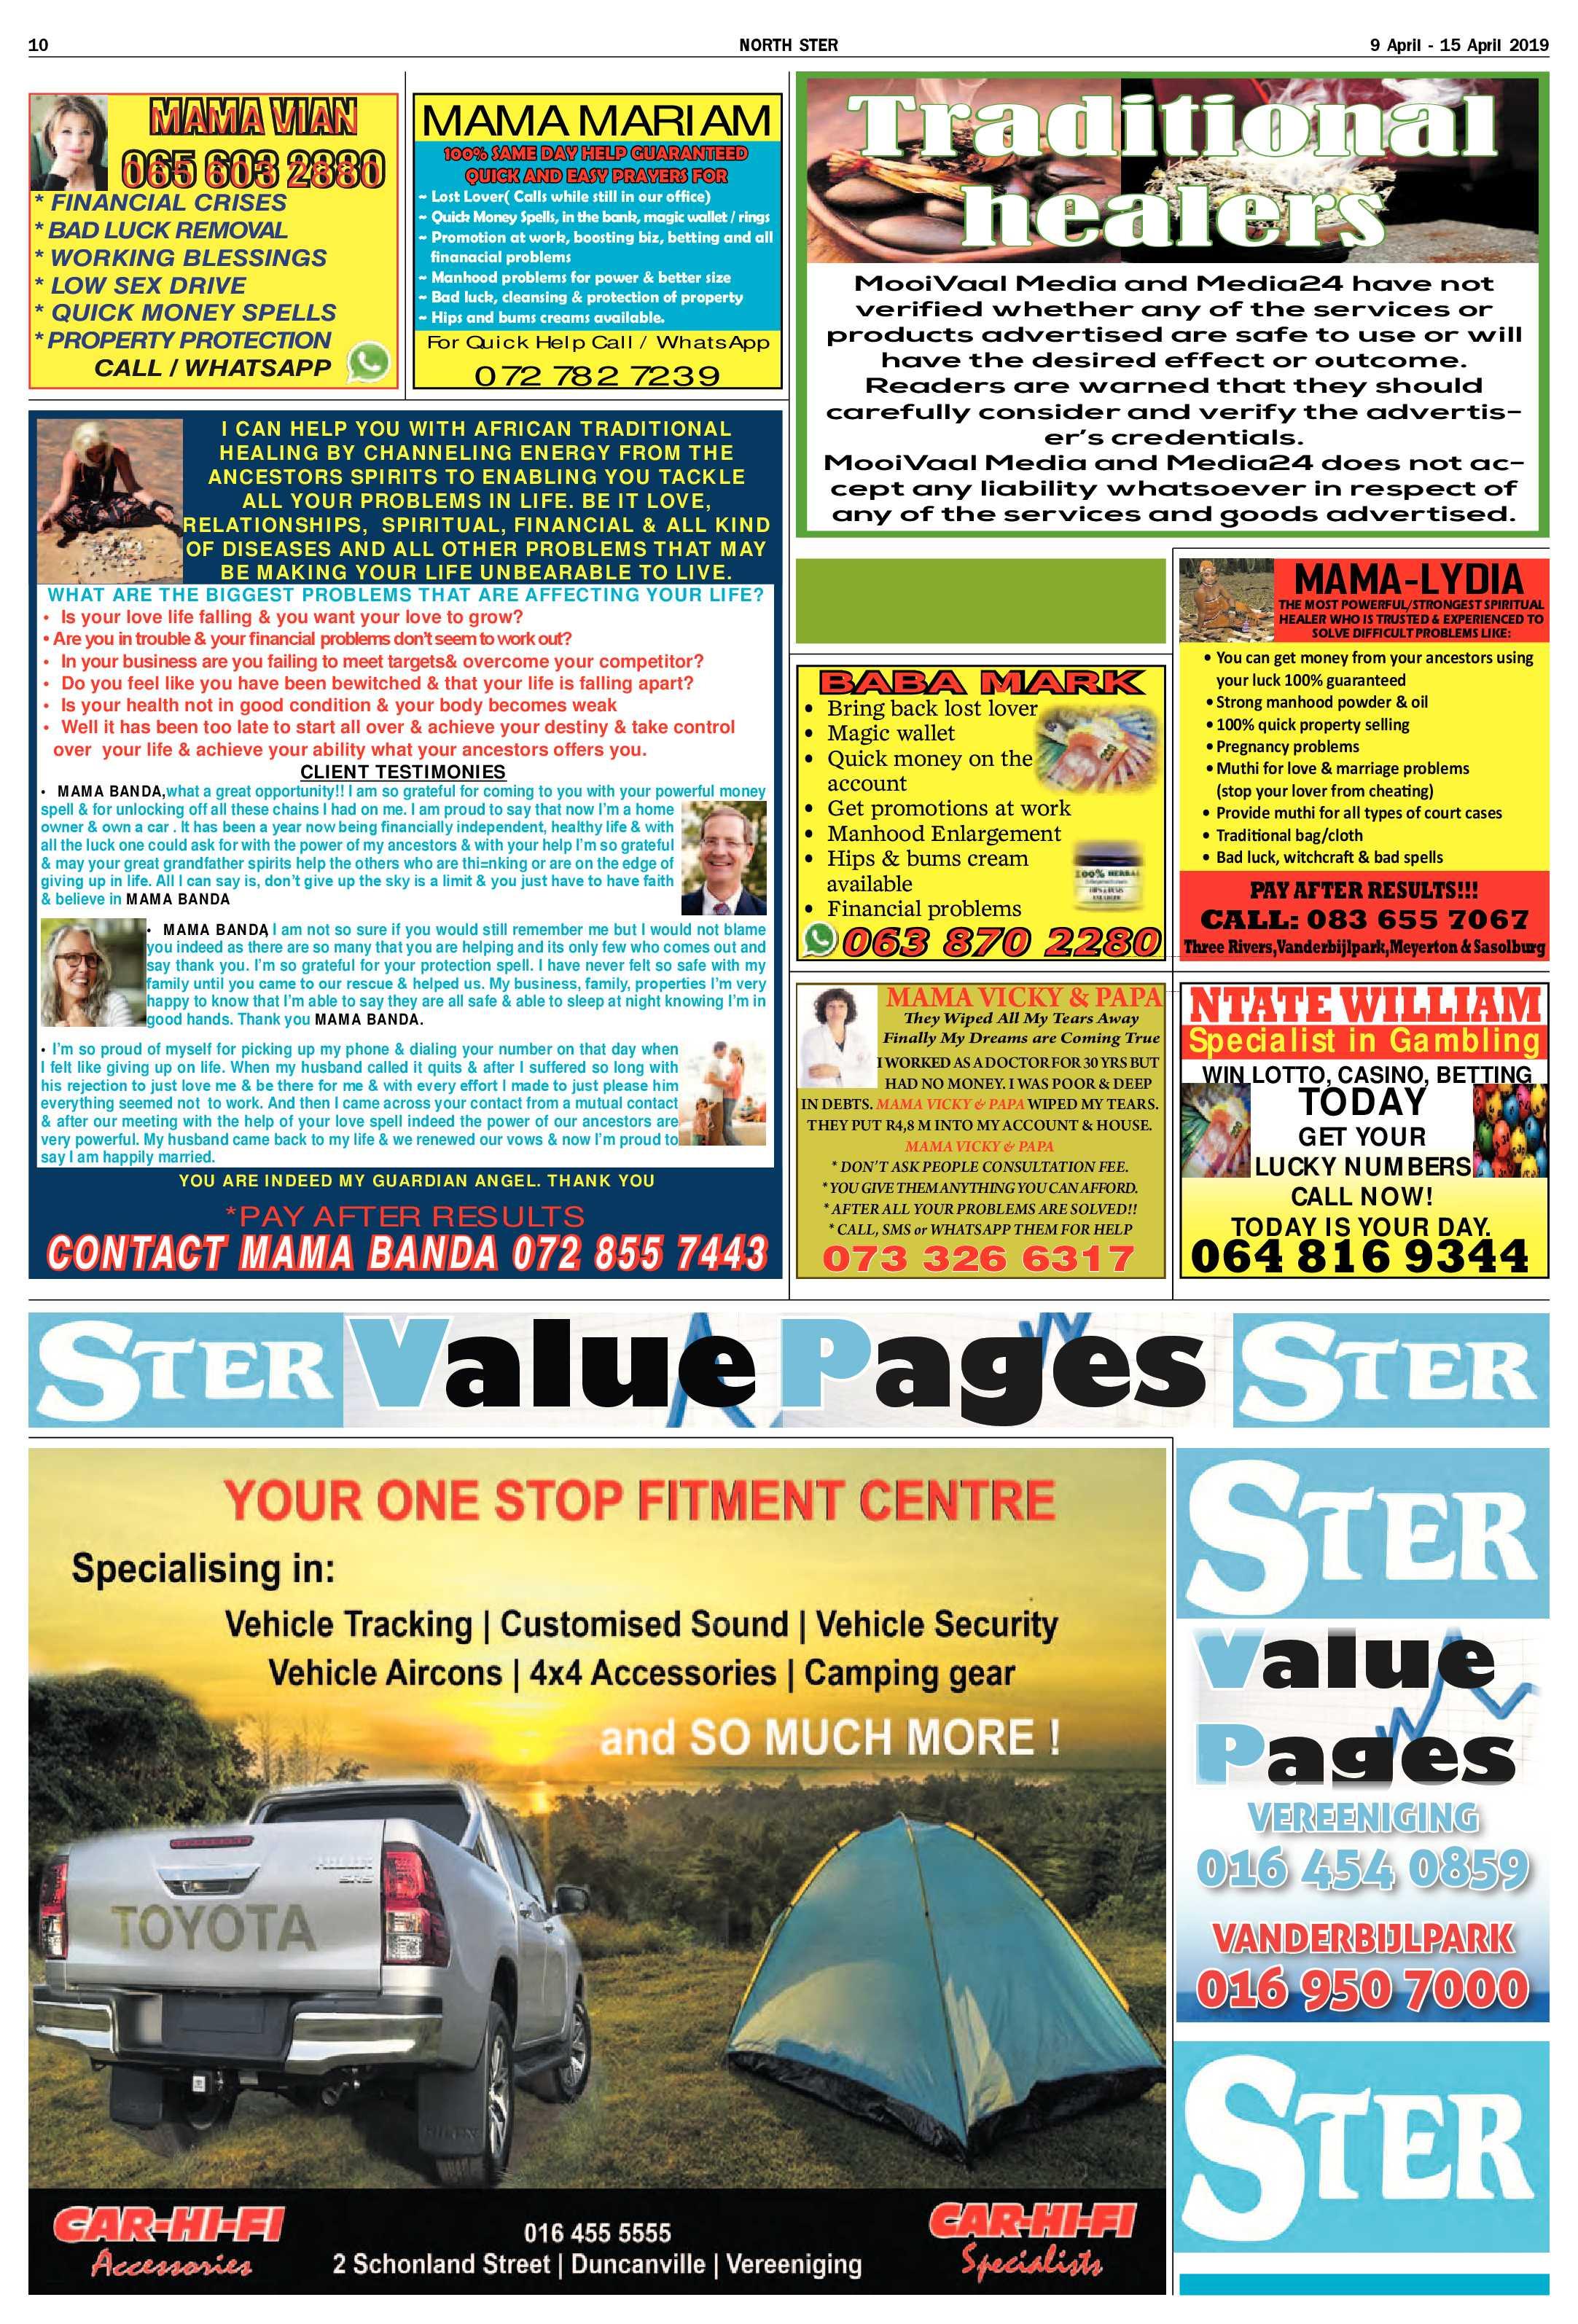 Ster North 9 - 15 April 2019 - vaalweekblad